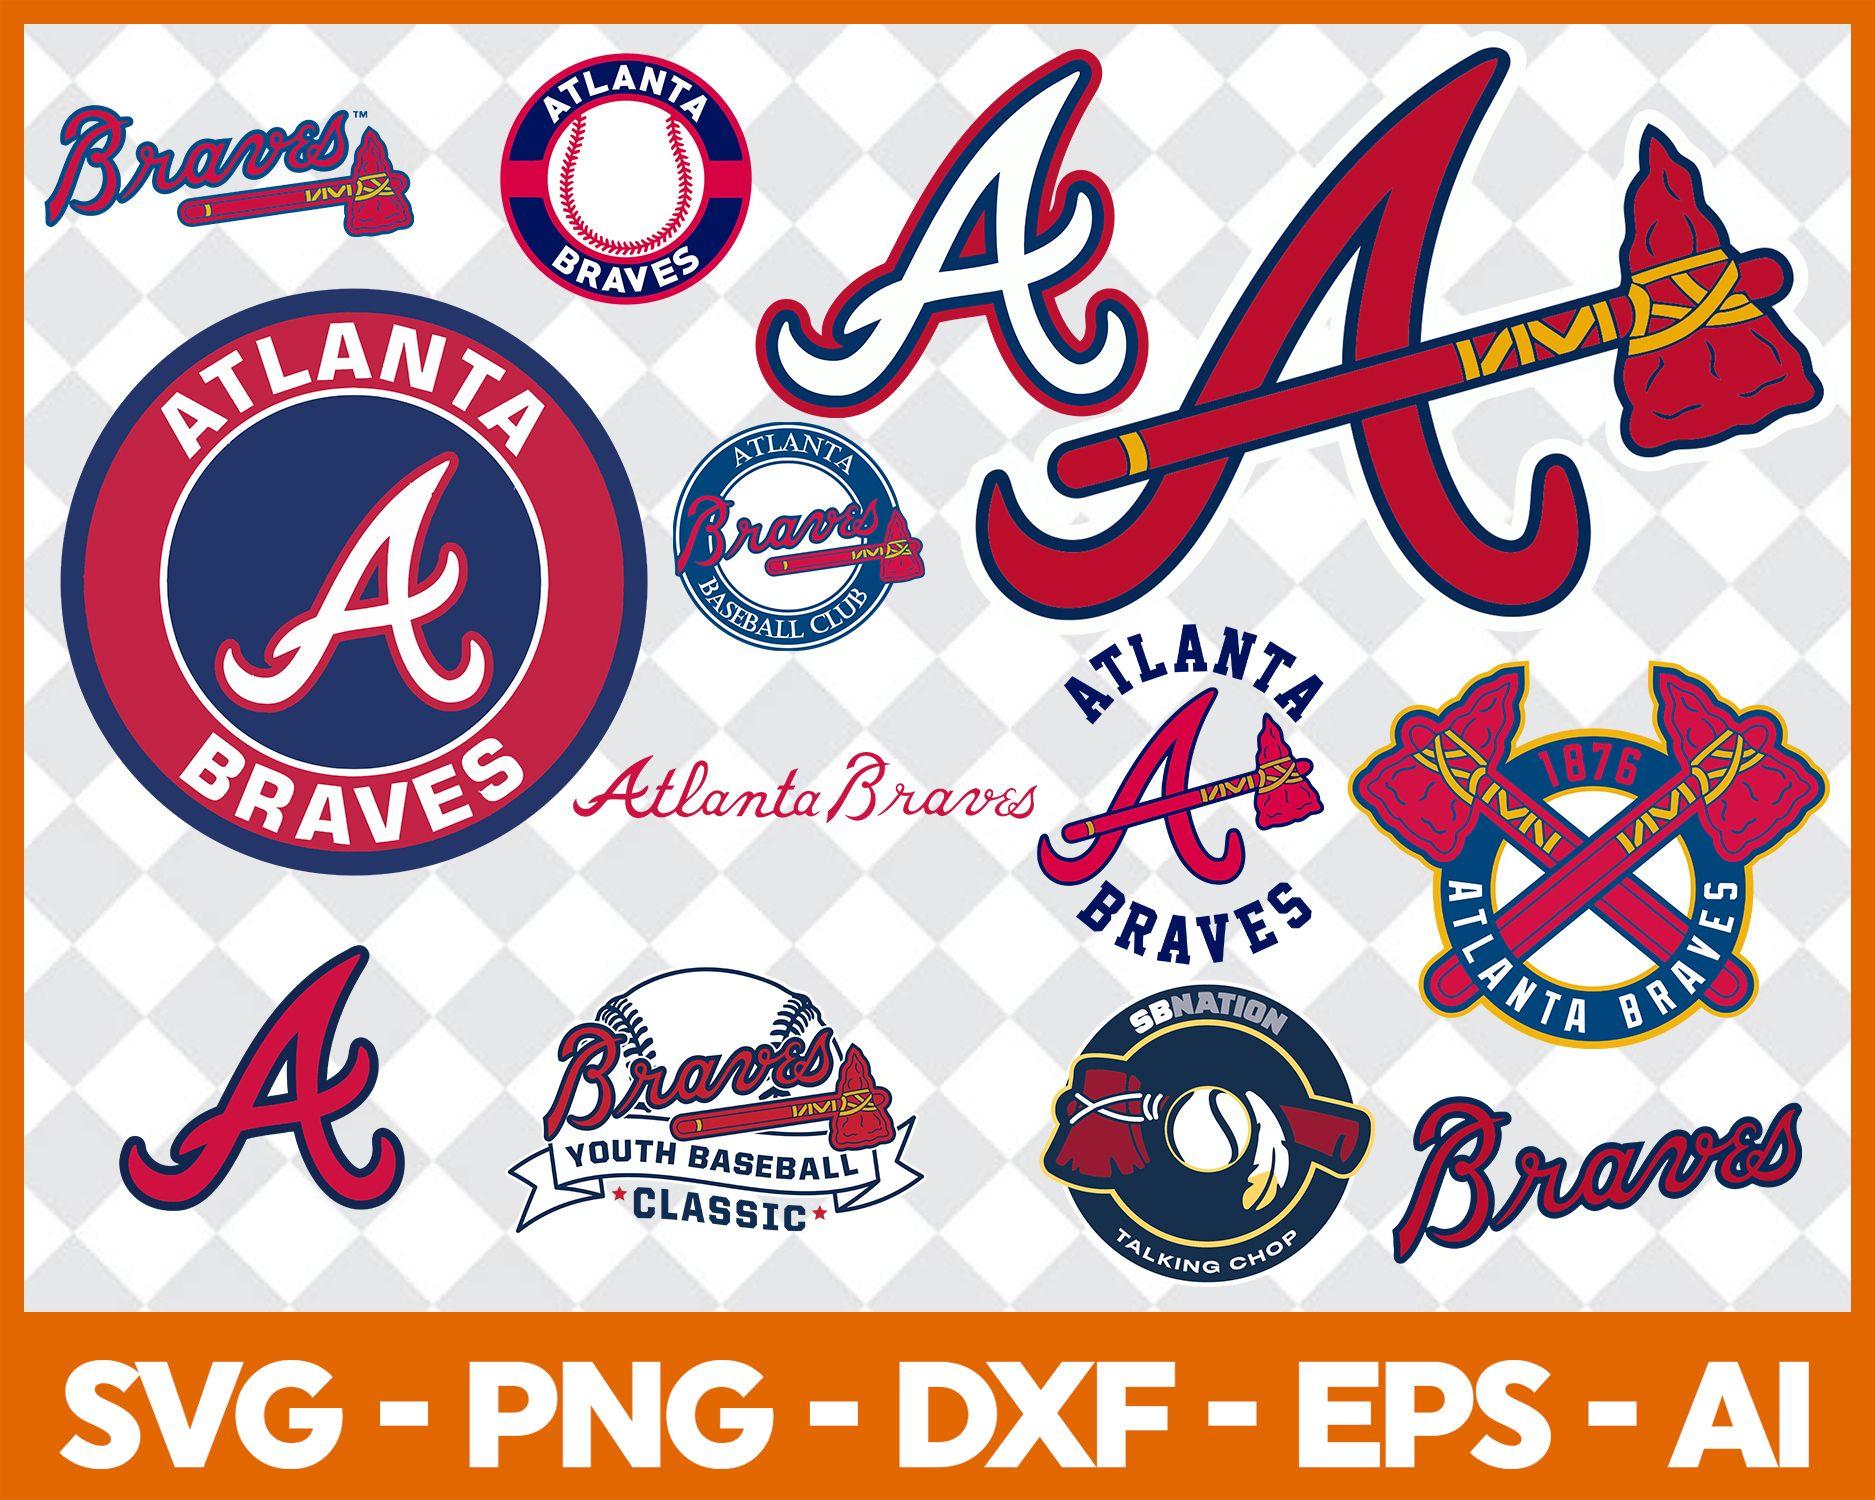 Atlanta Braves Svg Svg Files For Silhouette Files For Cricut Svg Dxf Eps Png Instant Download In 2020 Atlanta Braves Braves Baseball Svg